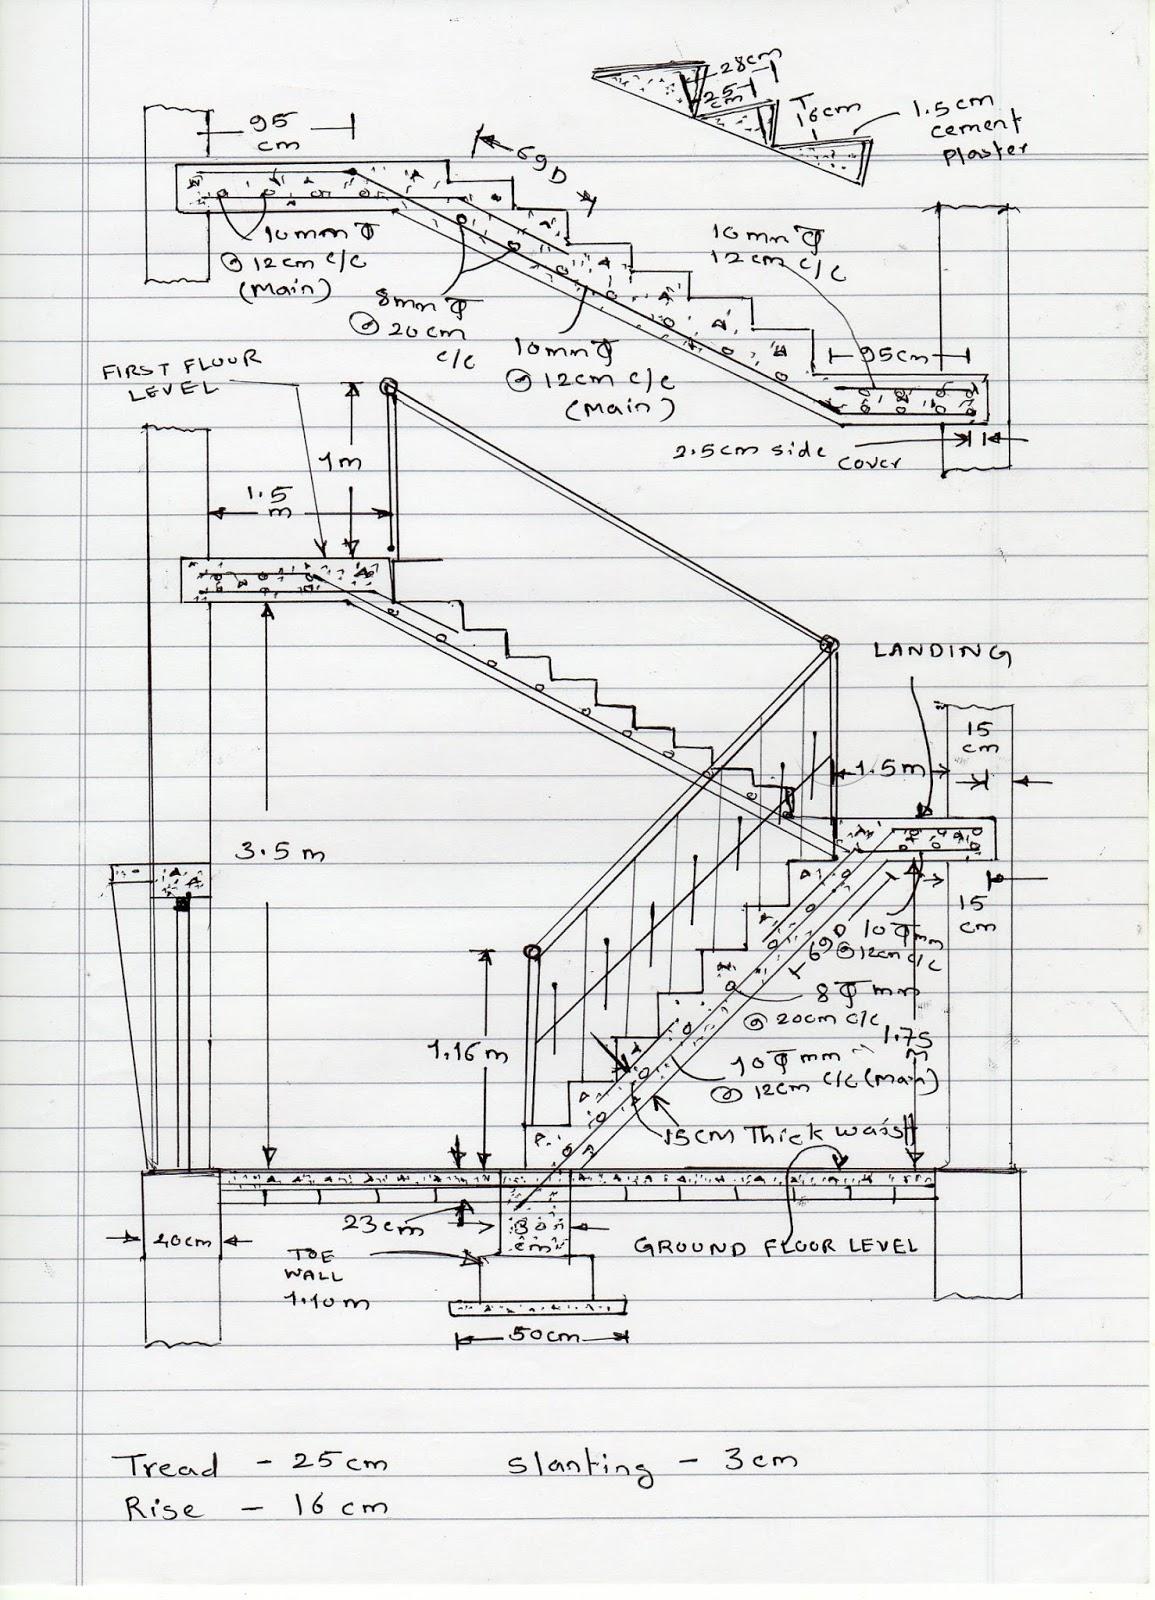 Volume Of Concrete Slab : How to calculate staircase concrete quantity مجلتك المعمارية